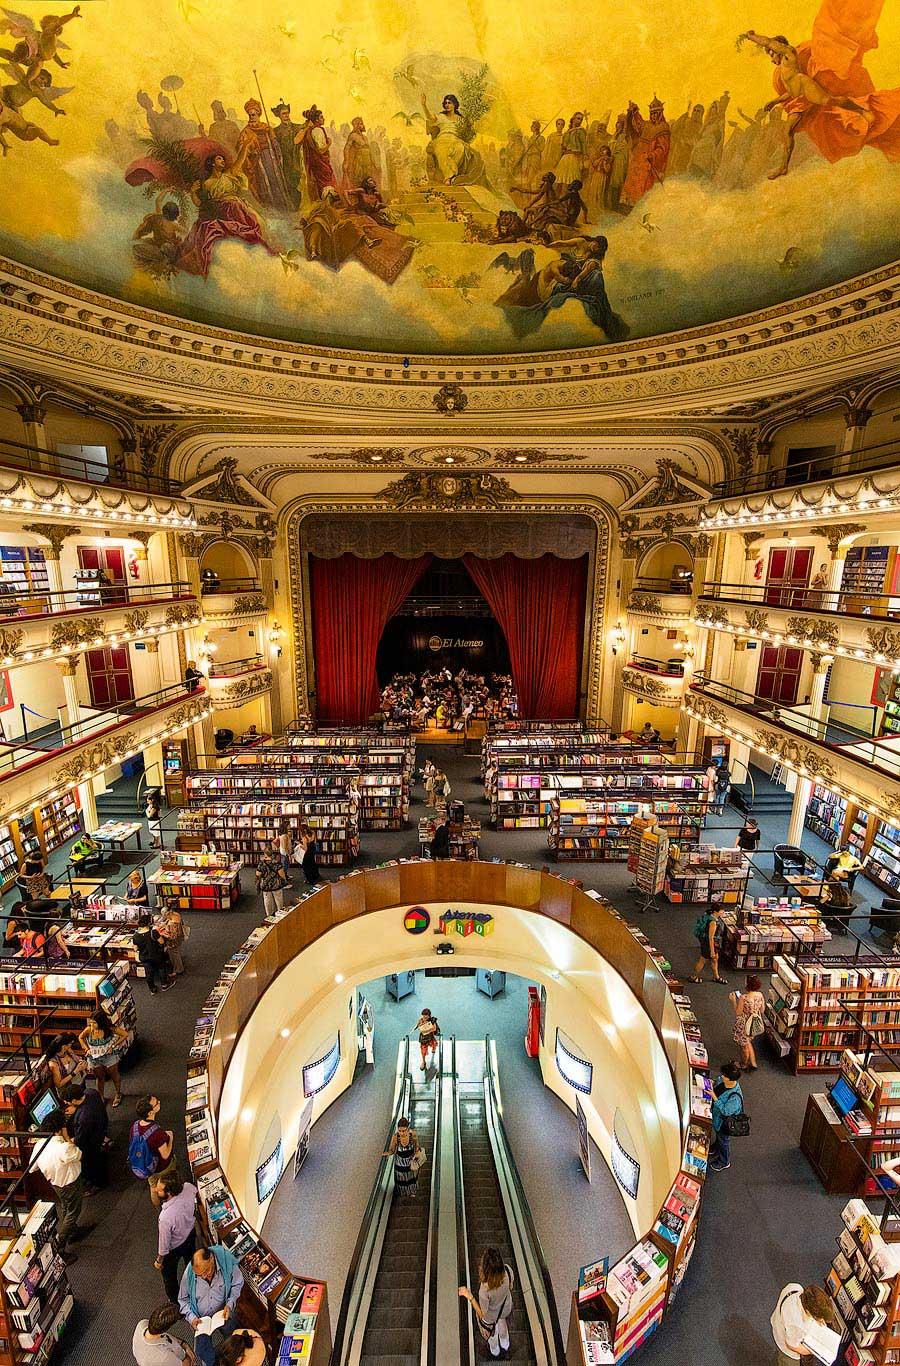 Ateneo Grand Splendid library, Buenos Aires